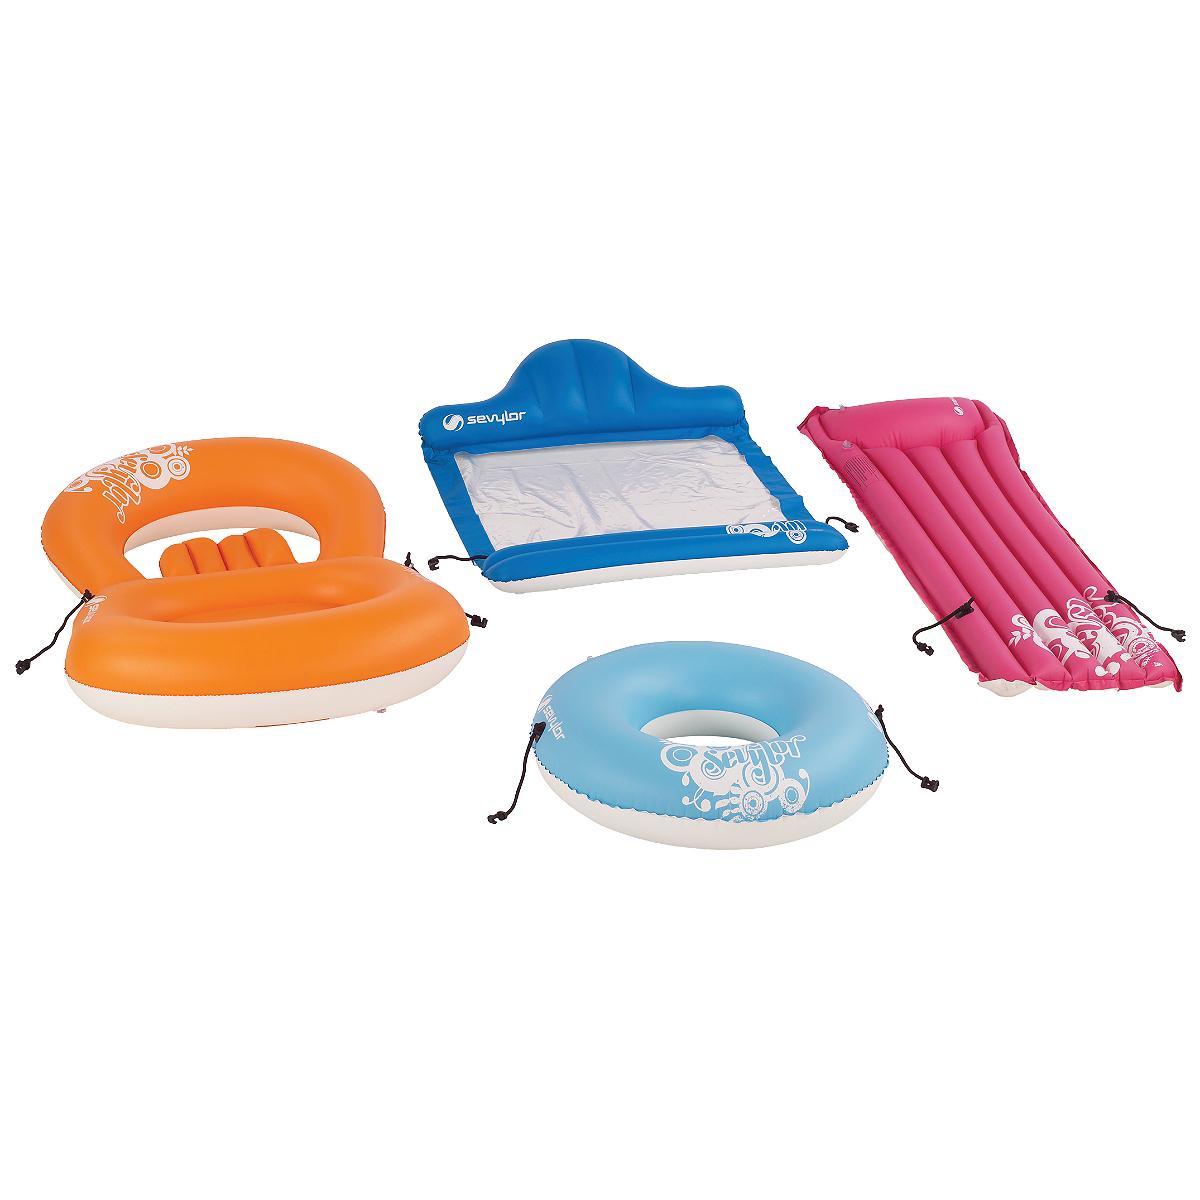 Shop Coleman Inflatable 4 Piece Pool Beach Set Free